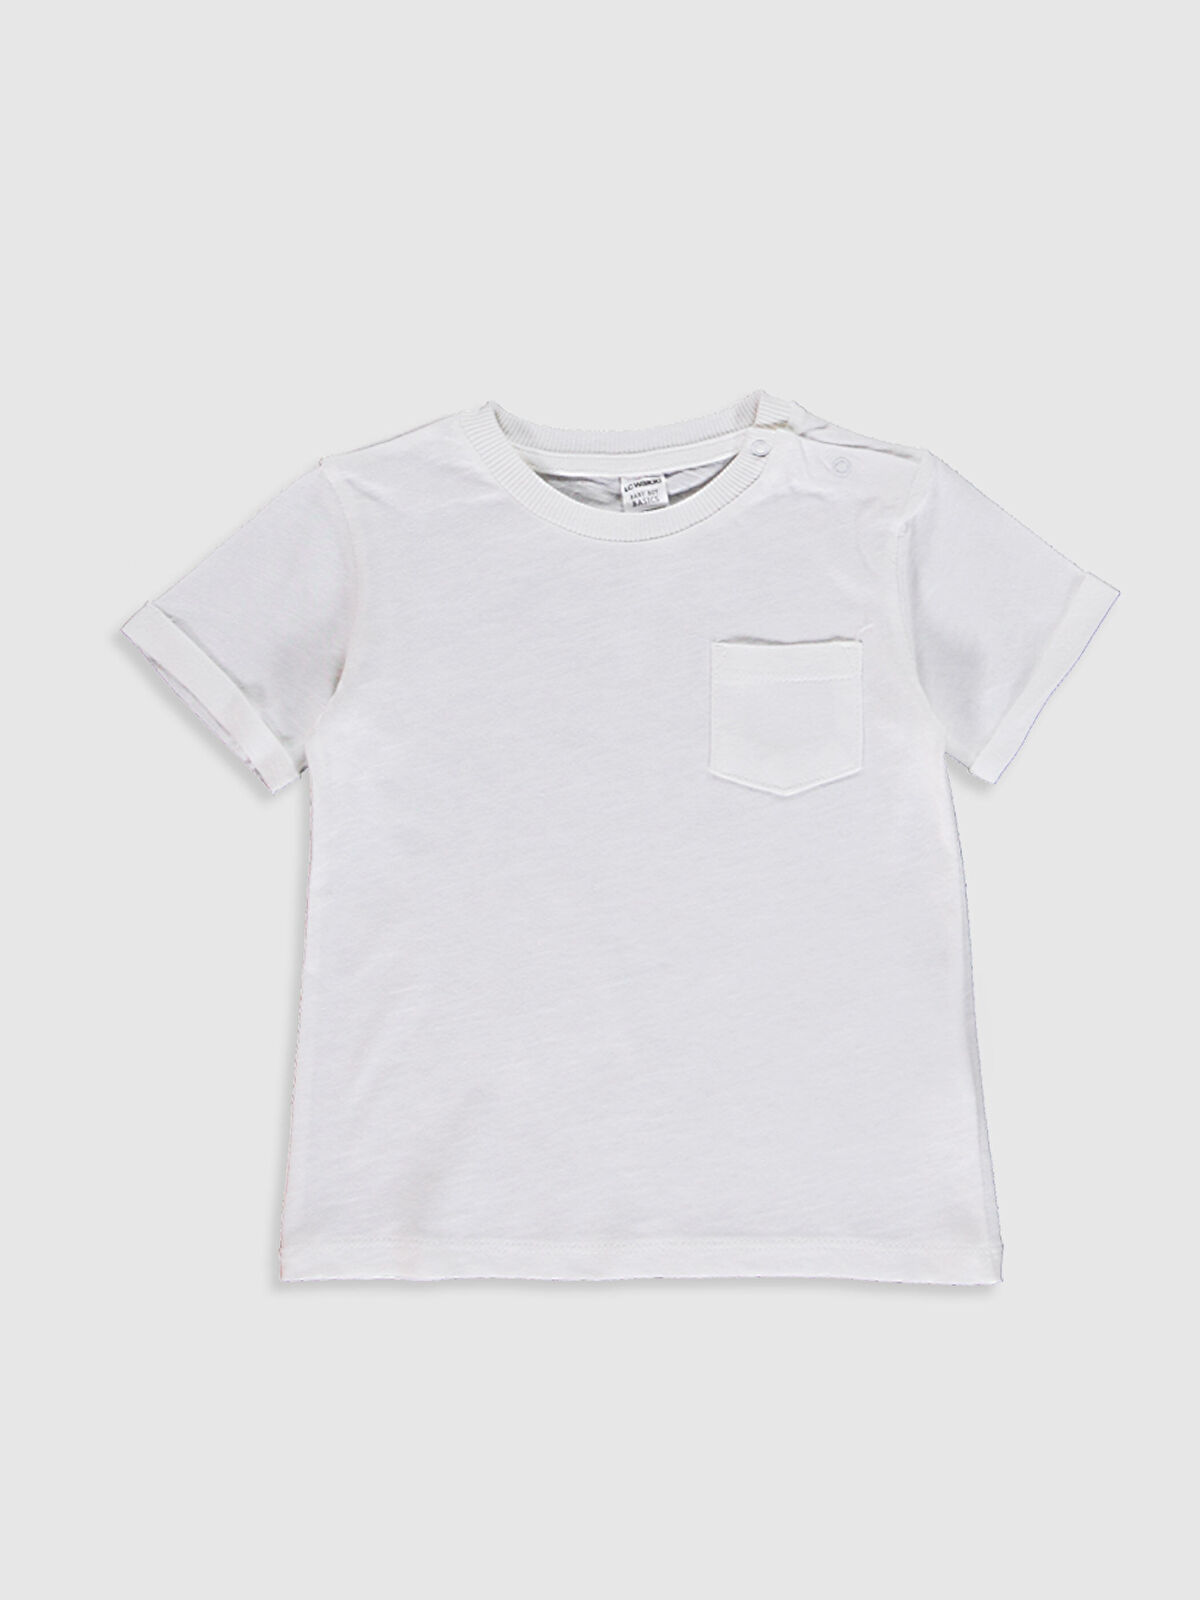 Erkek Bebek Pamuklu Basic Tişört - LC WAIKIKI